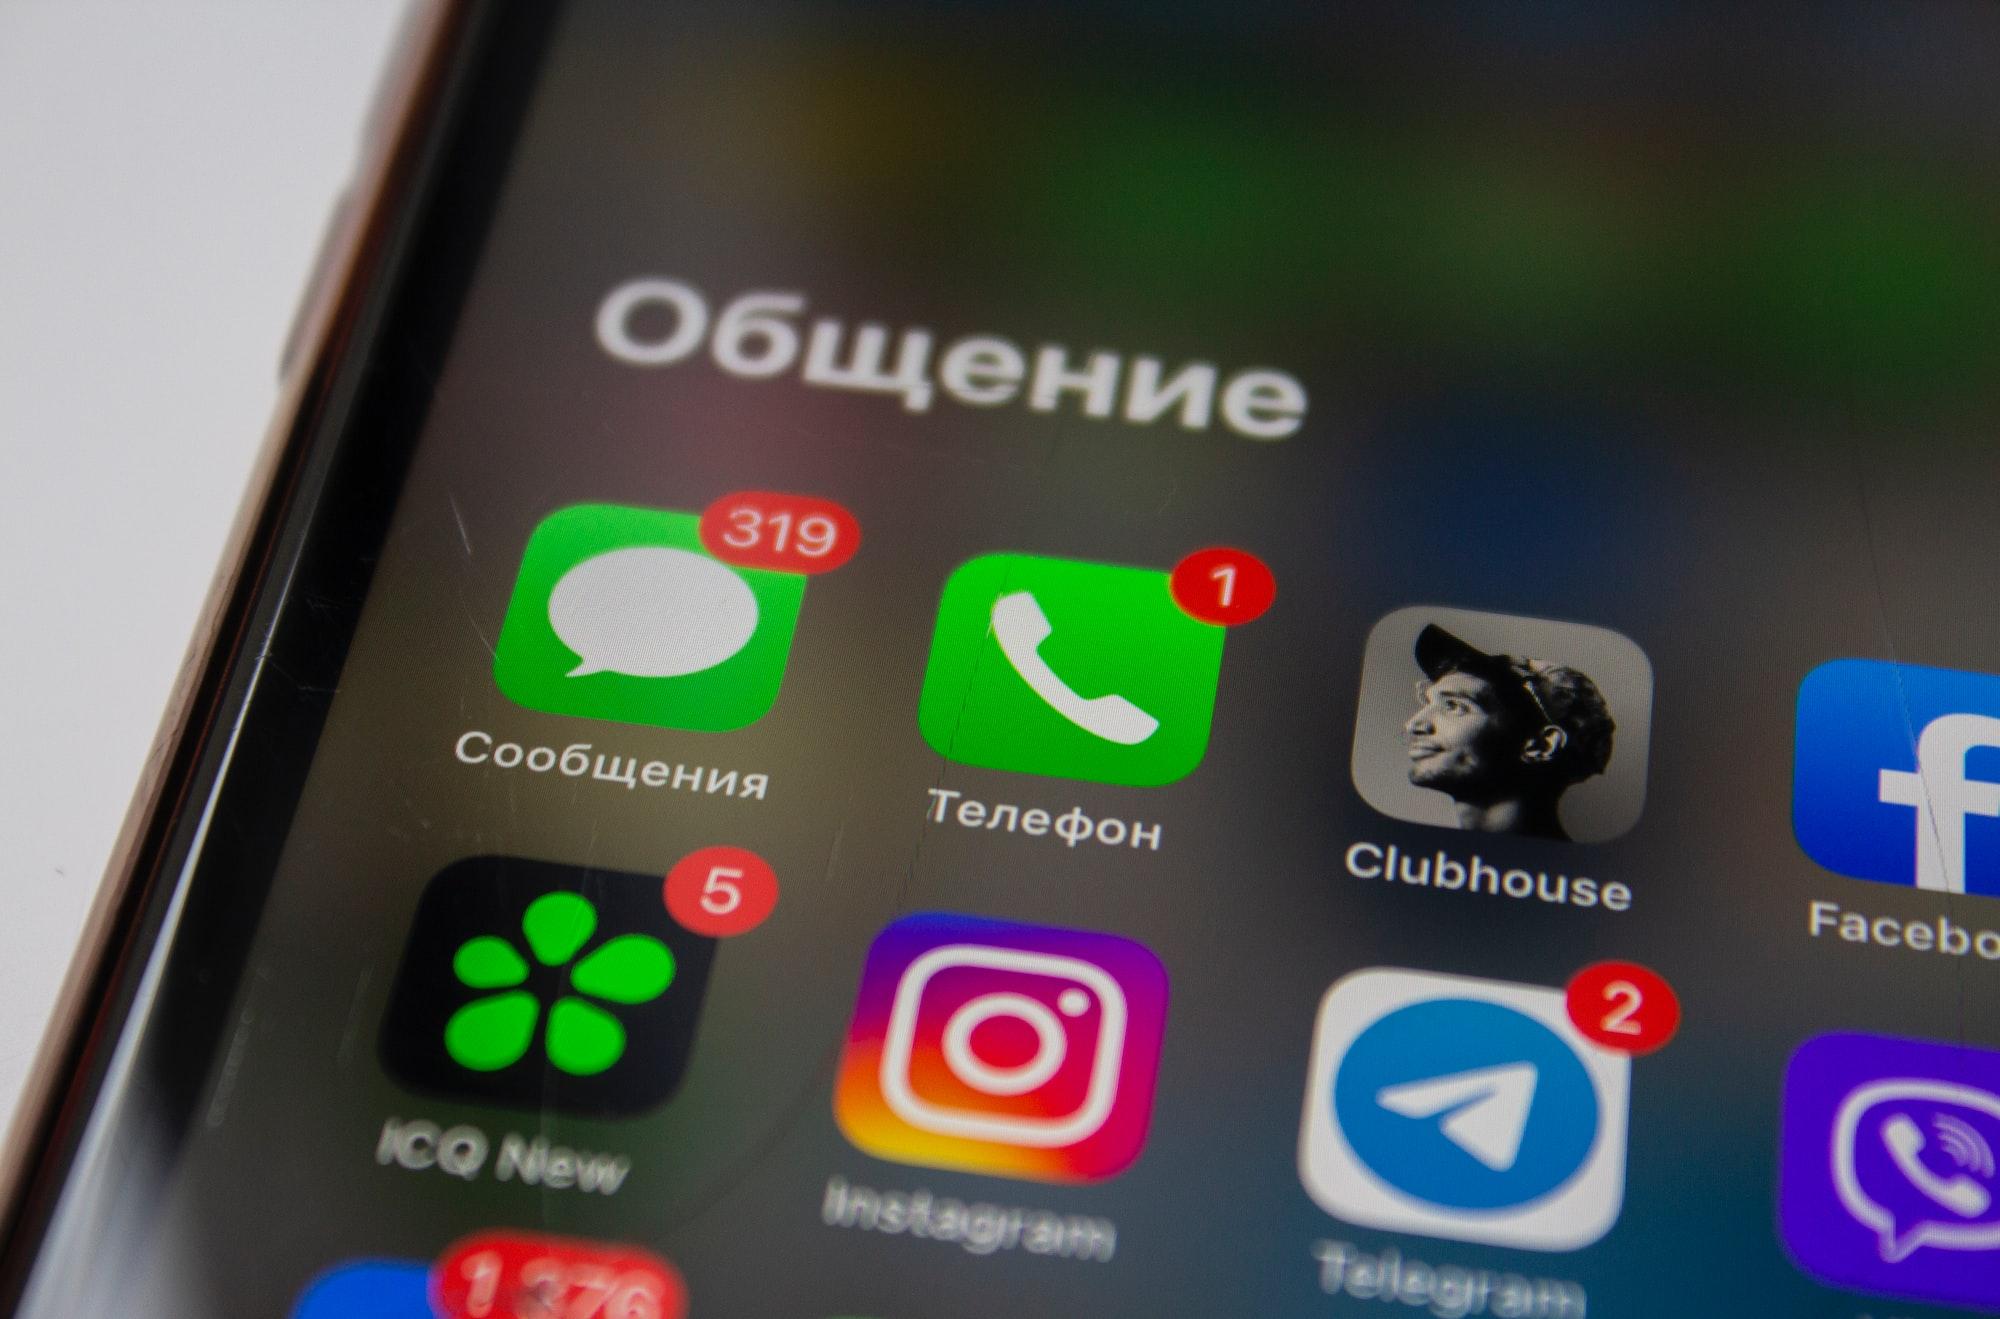 Проверка файла на наличие вирусов прямо в Telegram